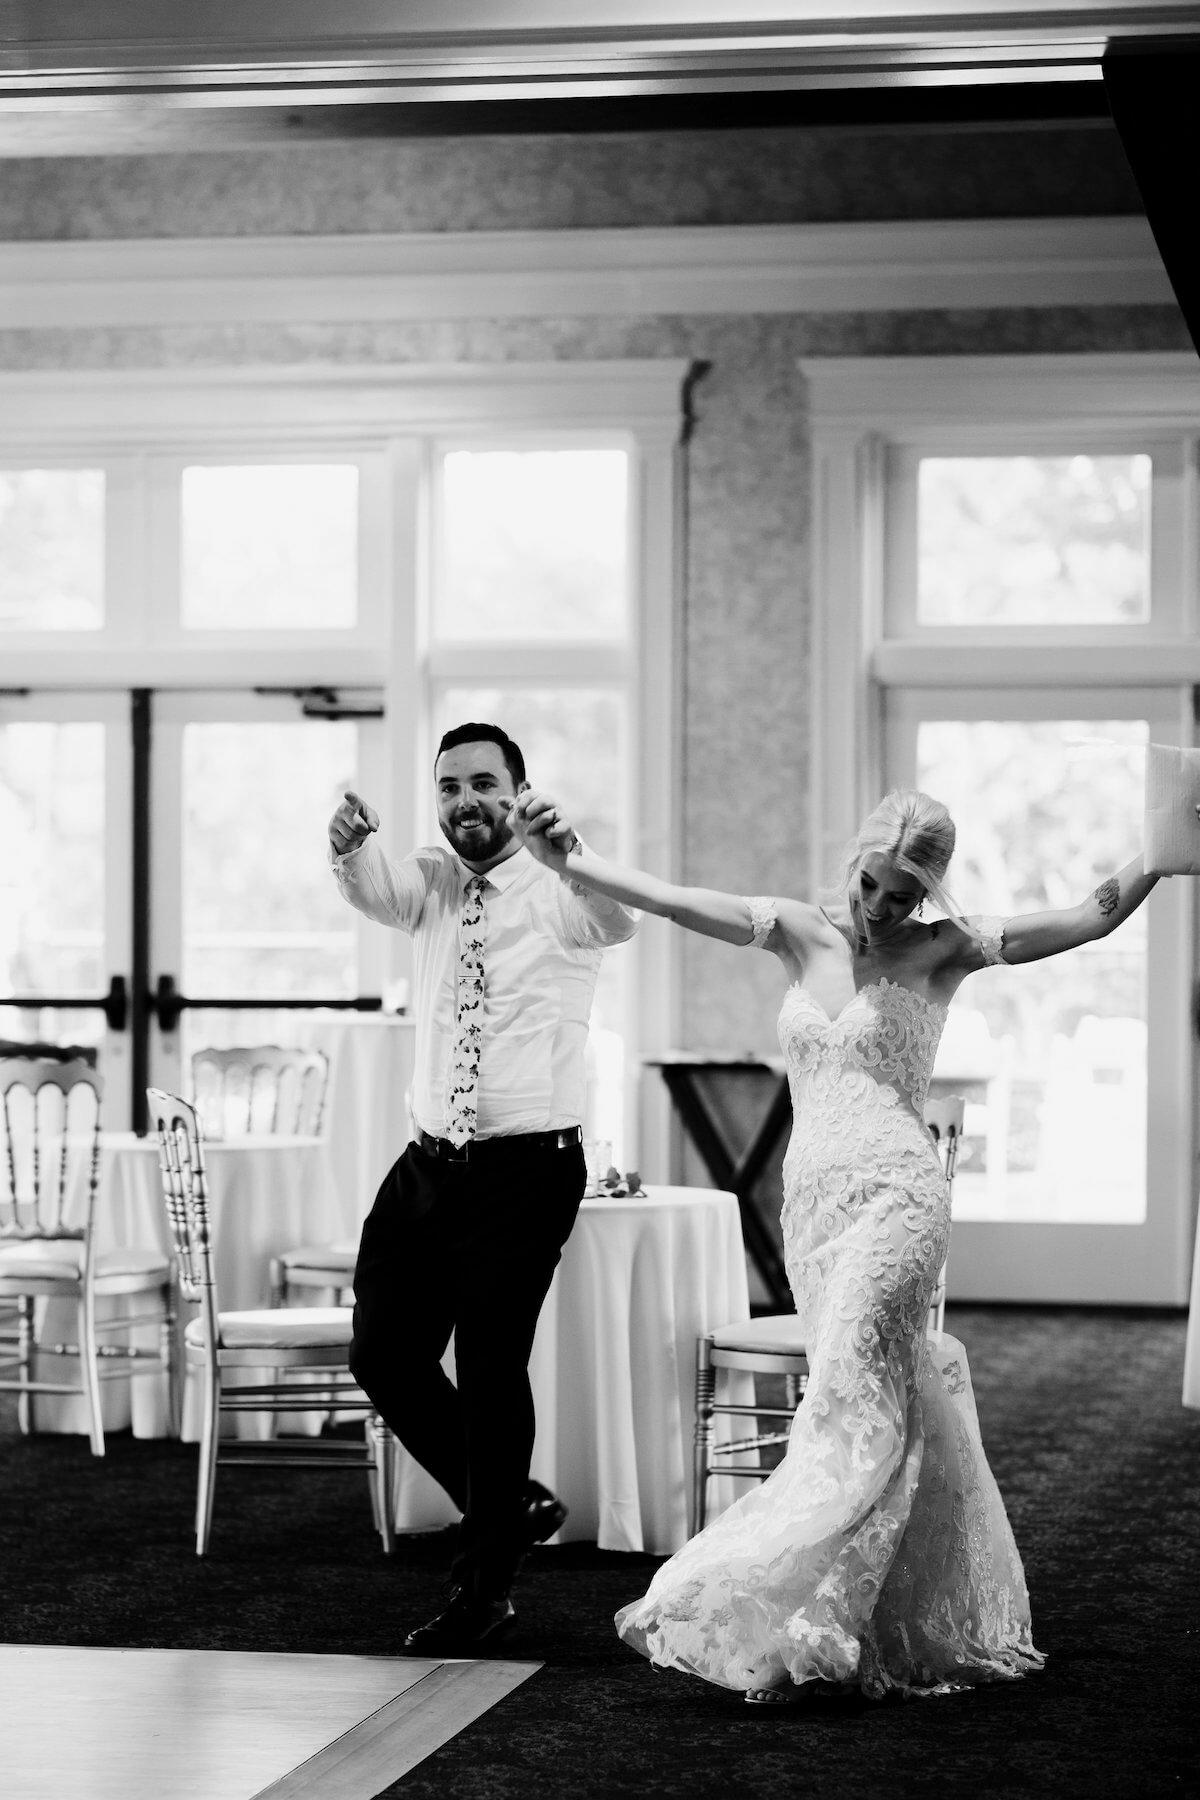 engle-olson-april-cj-wedding-jessica-holleque-14.jpg